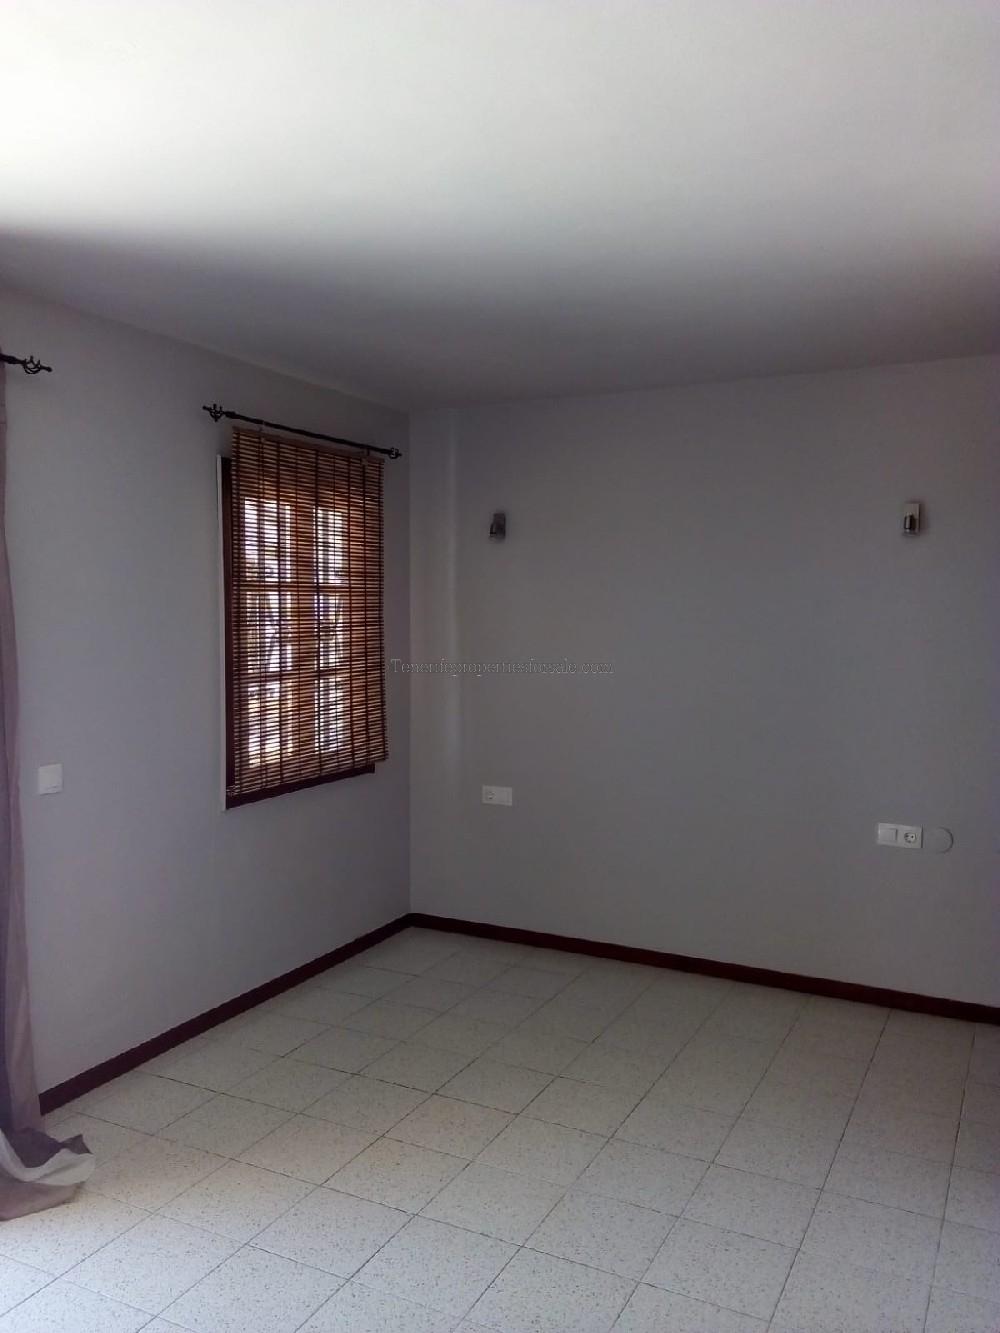 A0TVA627 Studio